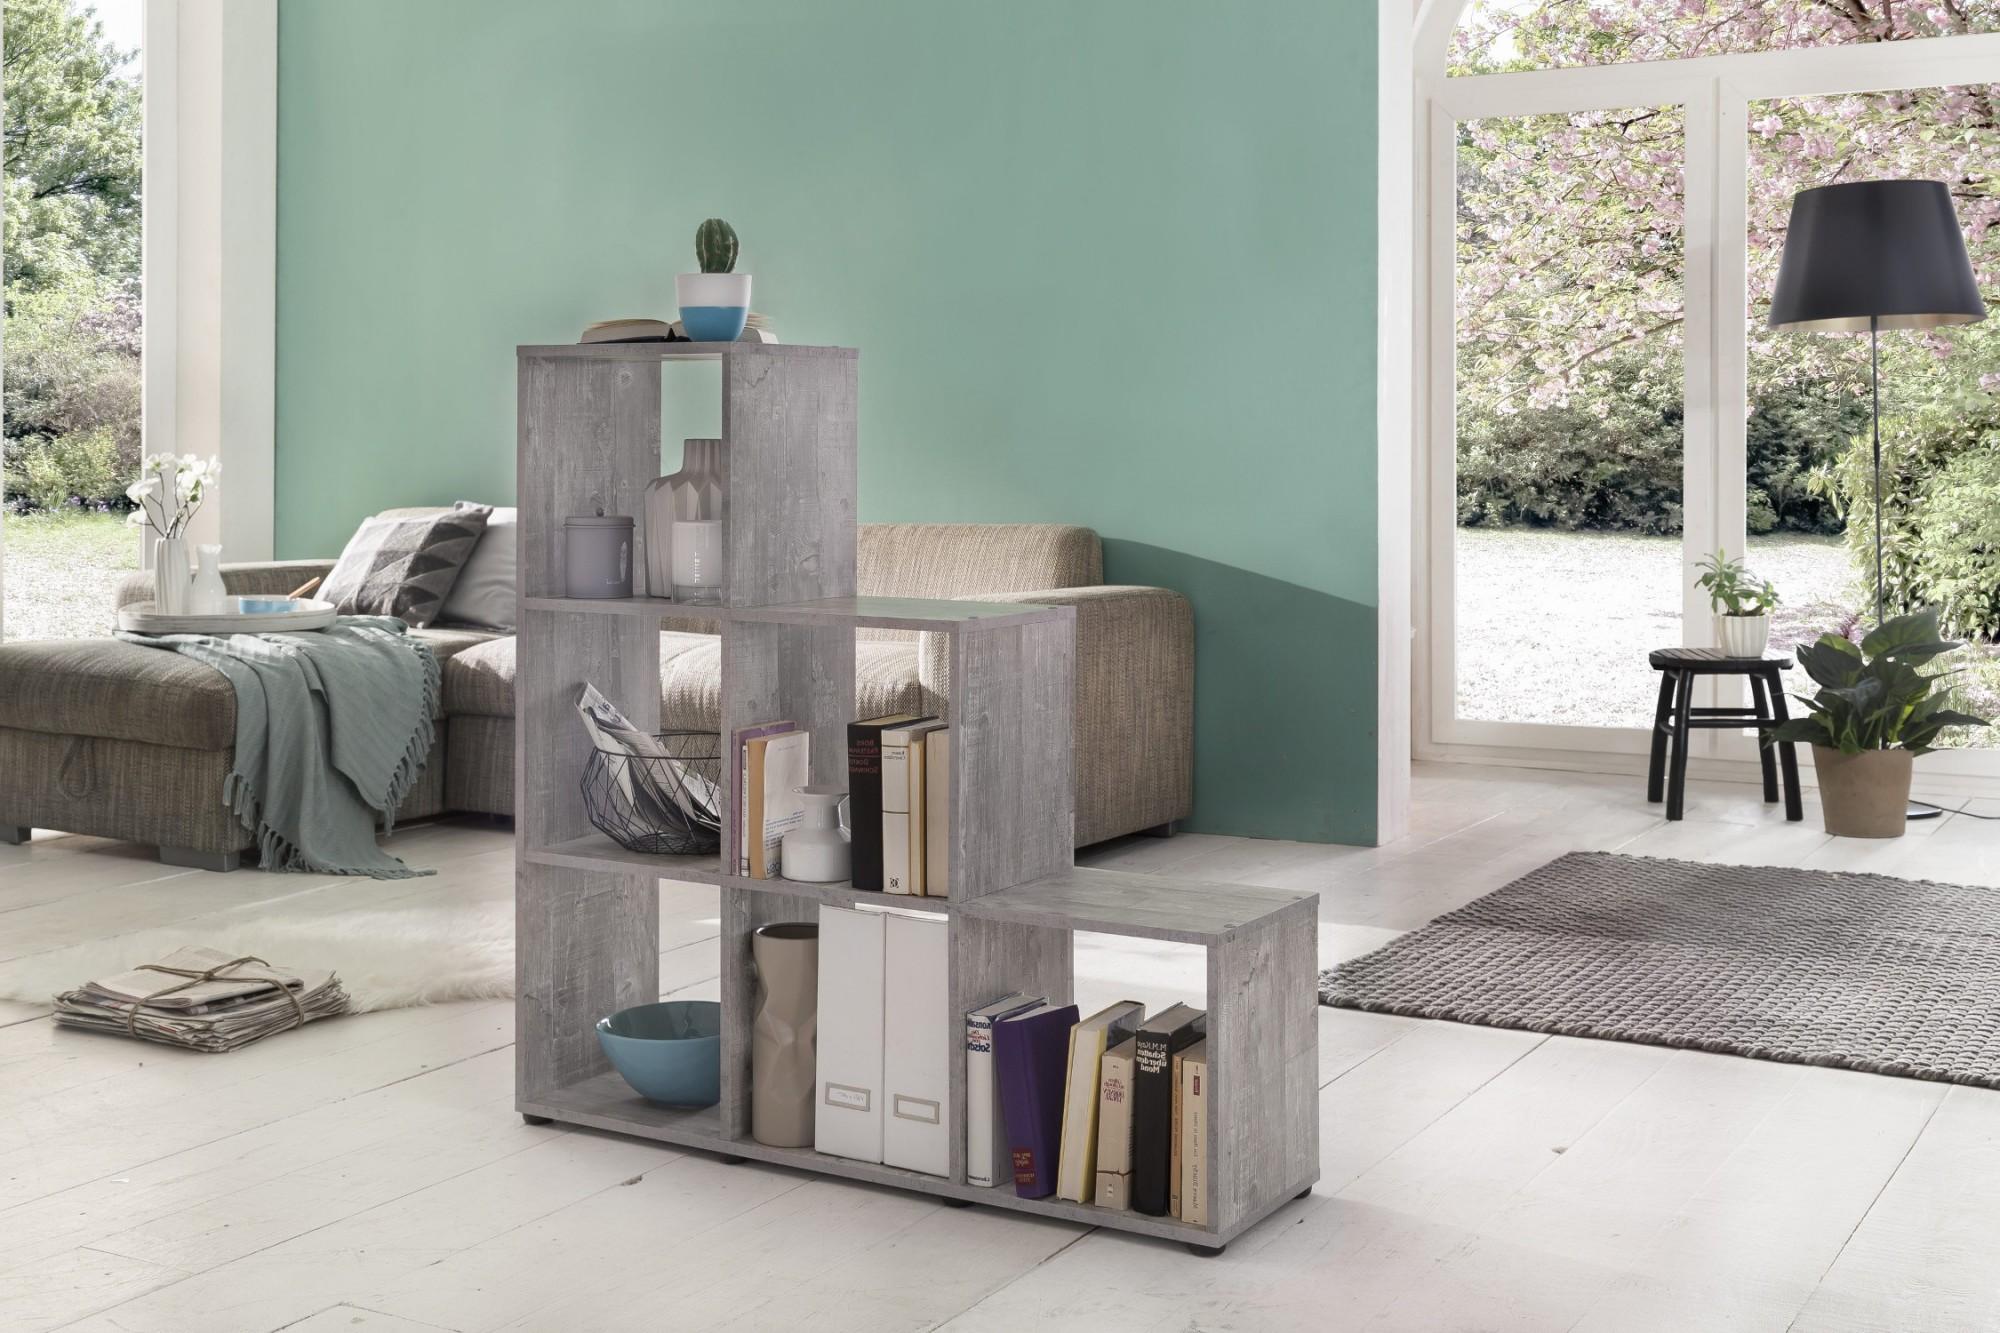 neu regal treppenregal 6 f cher stufenregal raumteiler b cherregal grau ebay. Black Bedroom Furniture Sets. Home Design Ideas